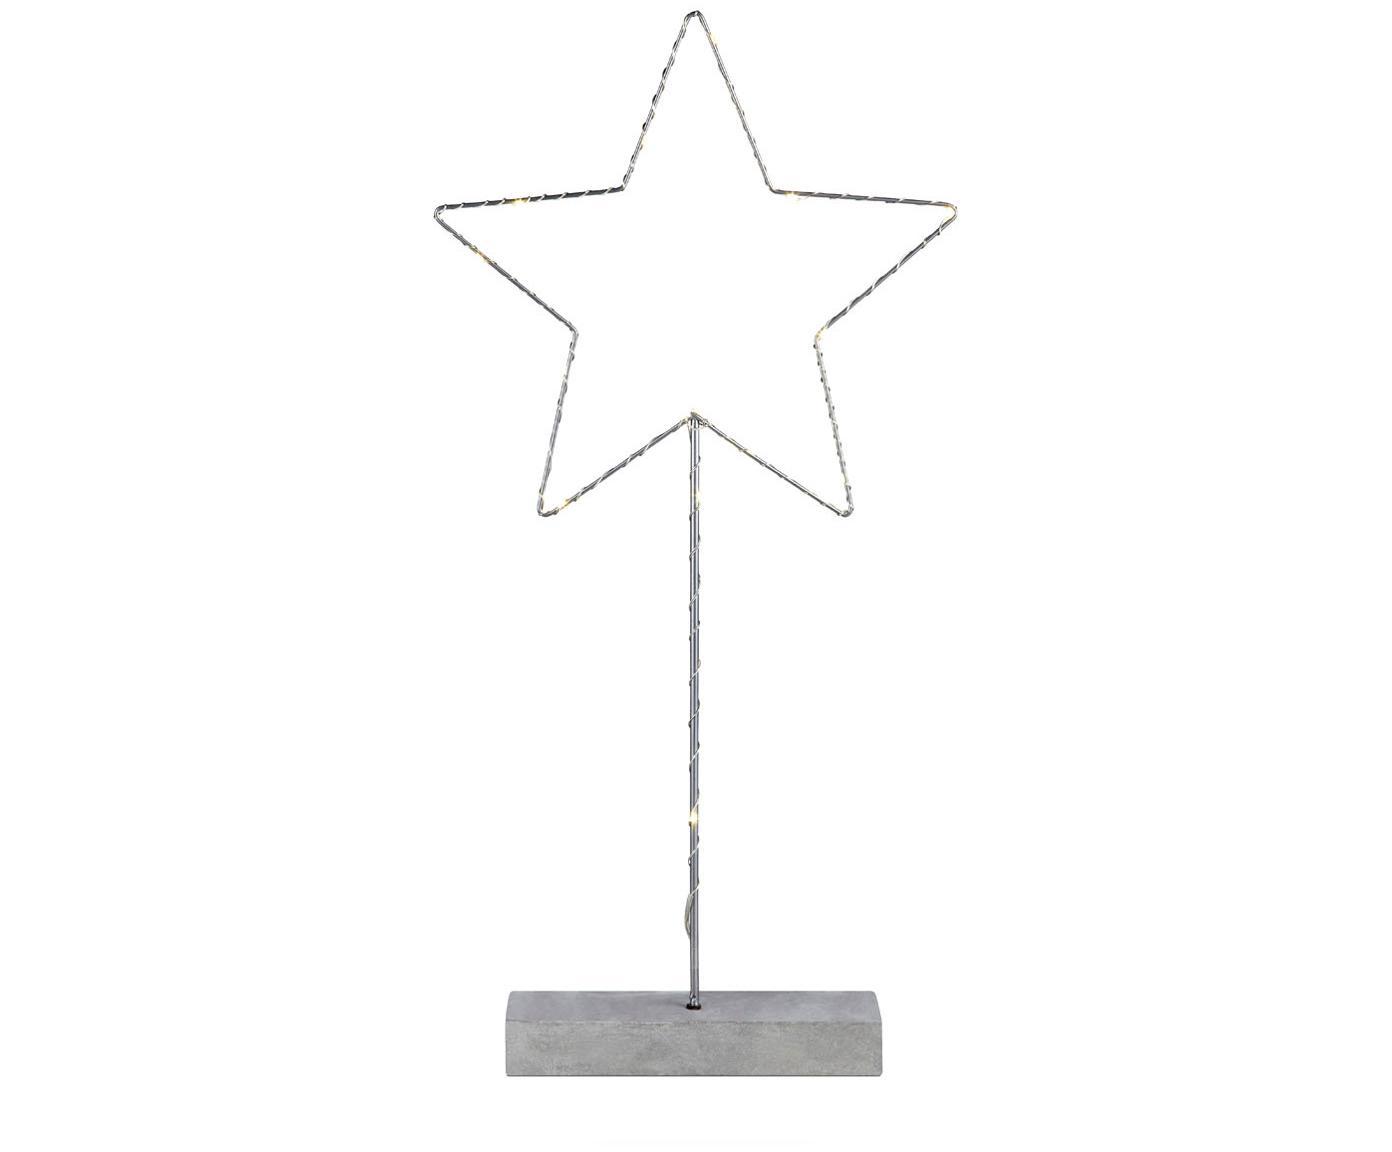 Lámpara de mesa LED Malin, Metal pintado, Gris, An 26 x Al 51 cm